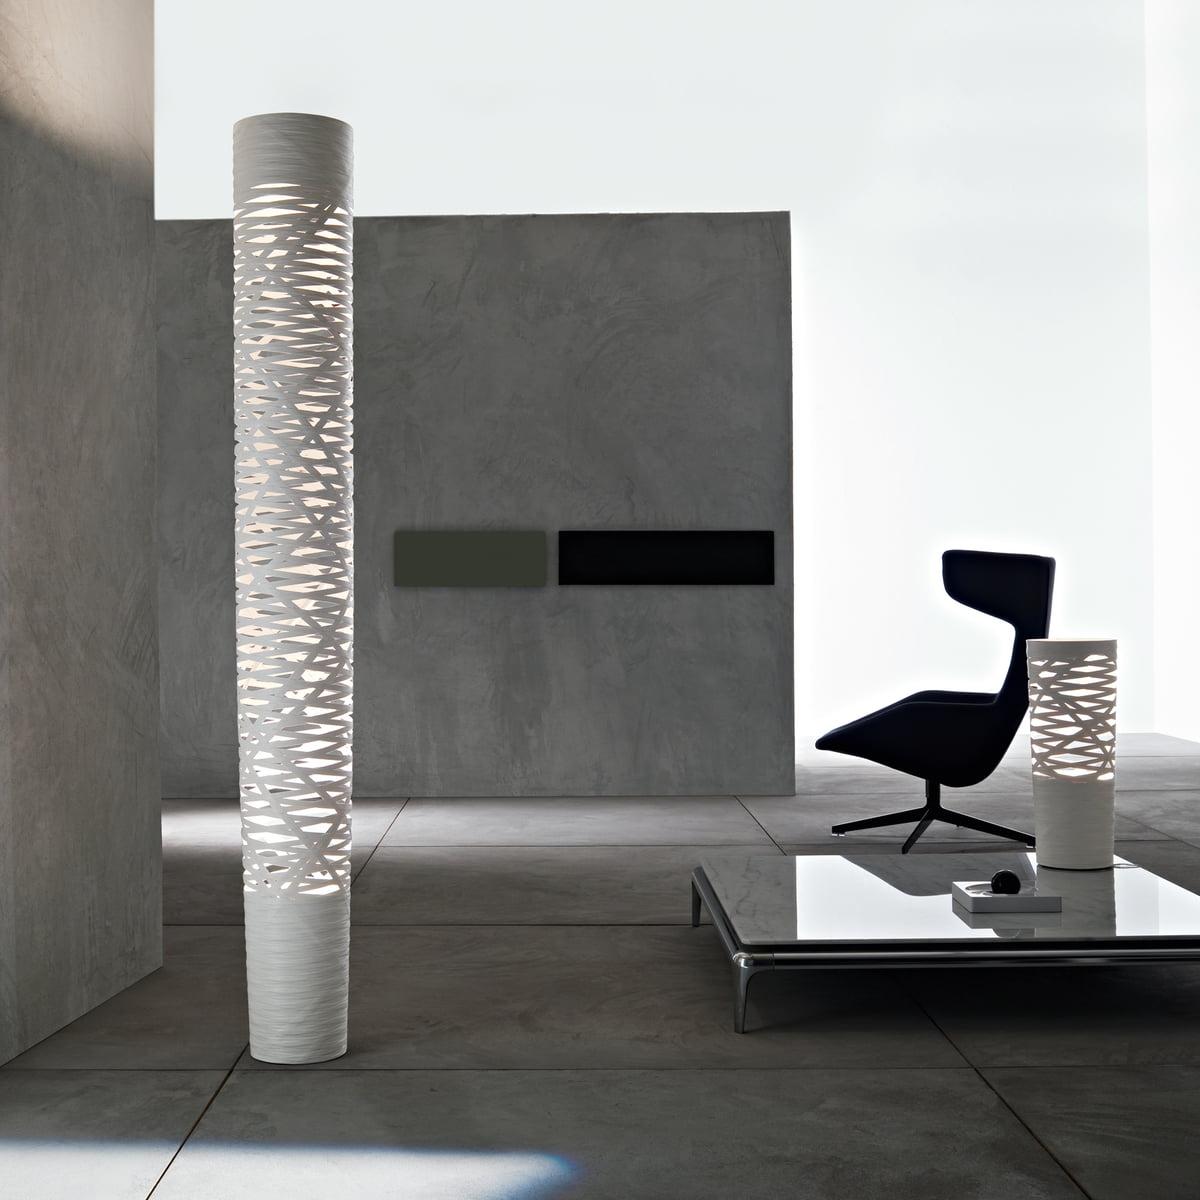 Lampadaire TRESS design de Marc Sadler